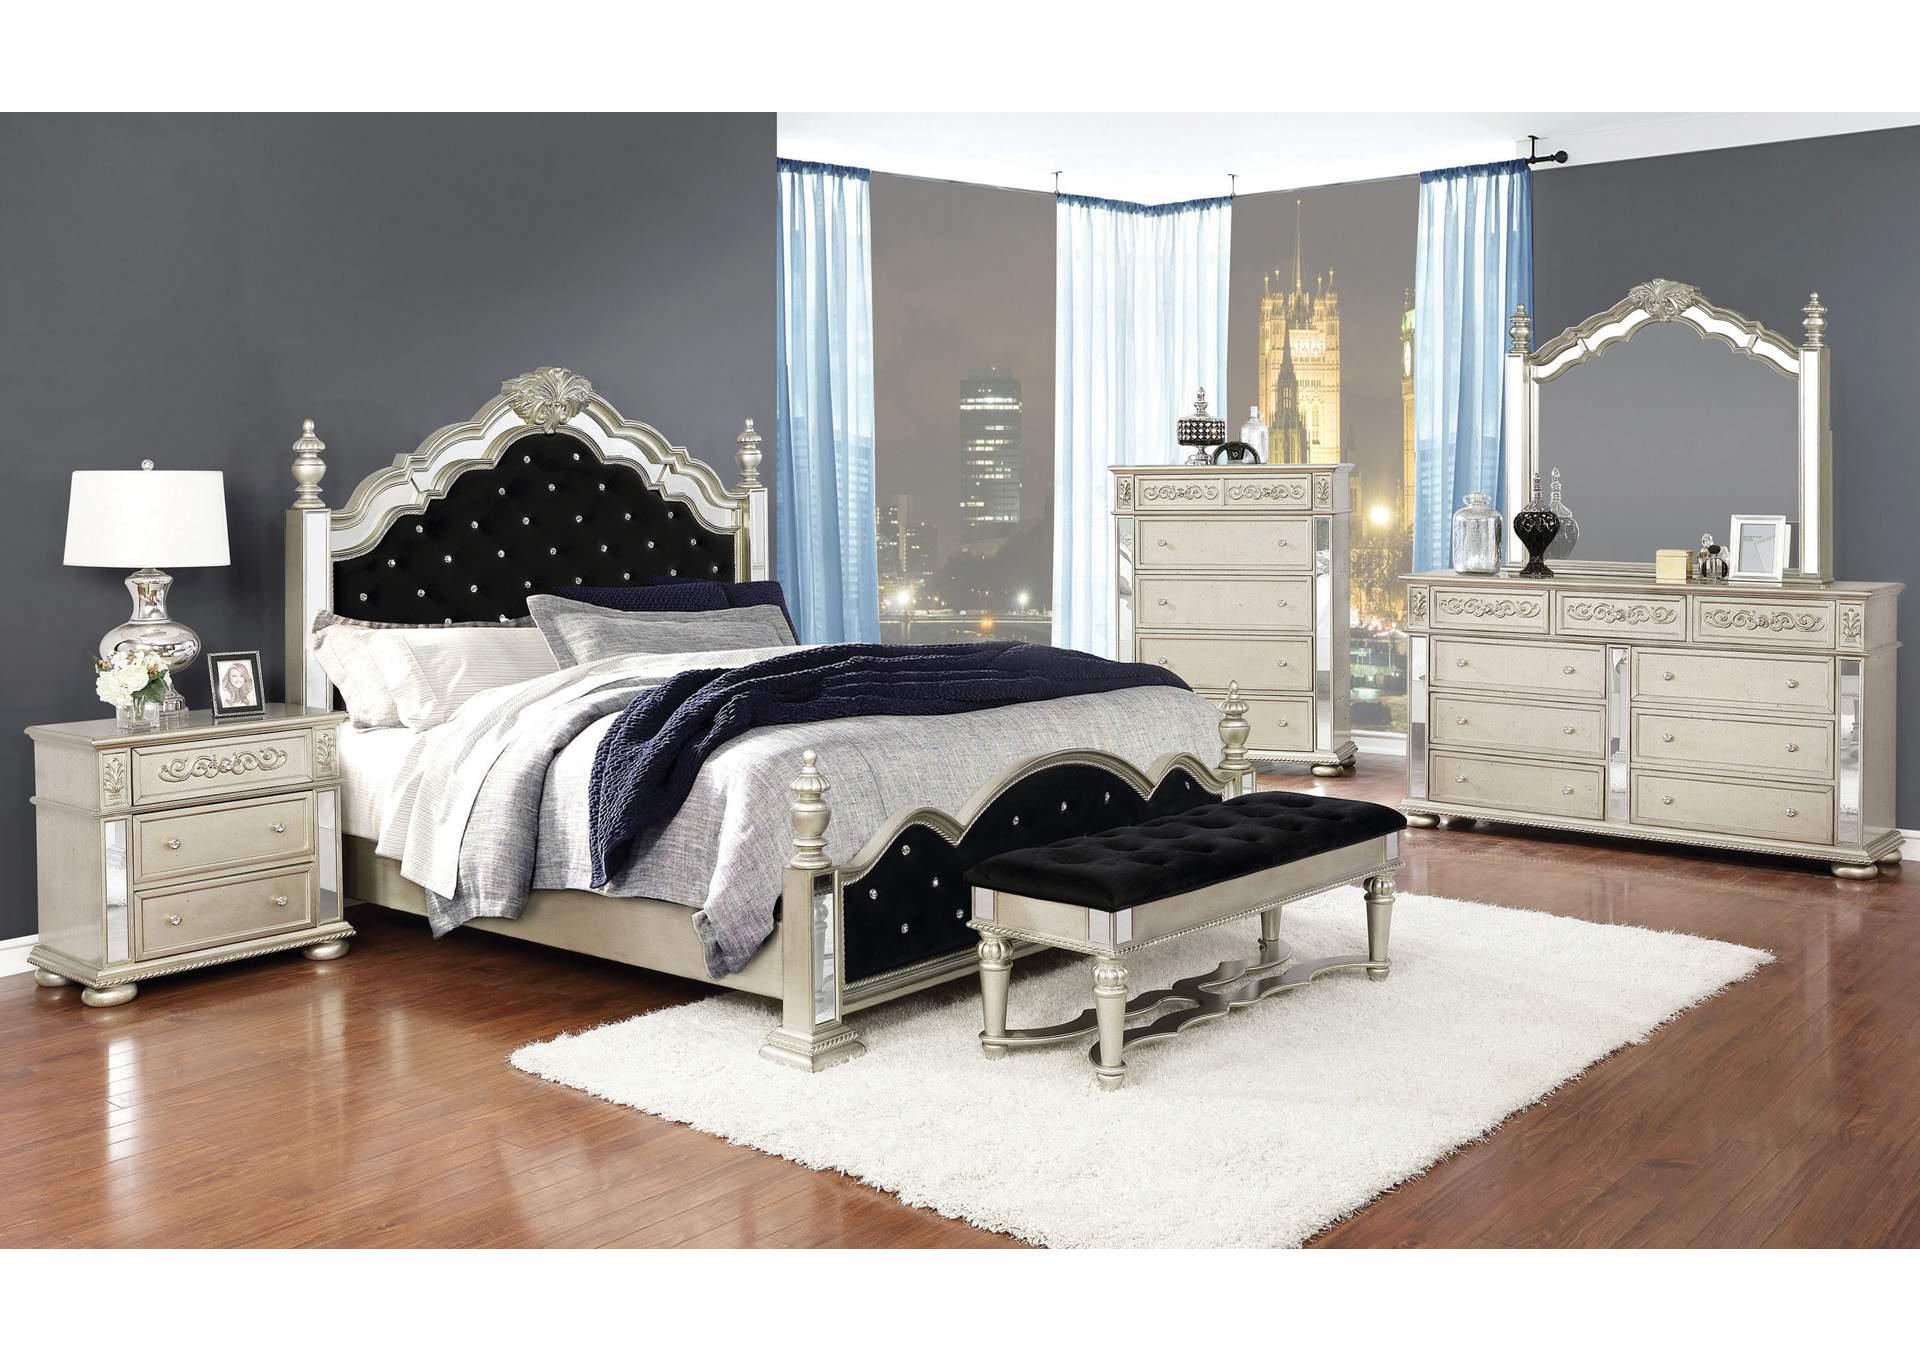 Heidi Scarpa Flow 4 Piece Eastern King Bedroom Set S S Furniture Gallery,Vital Proteins Collagen Creamer Review